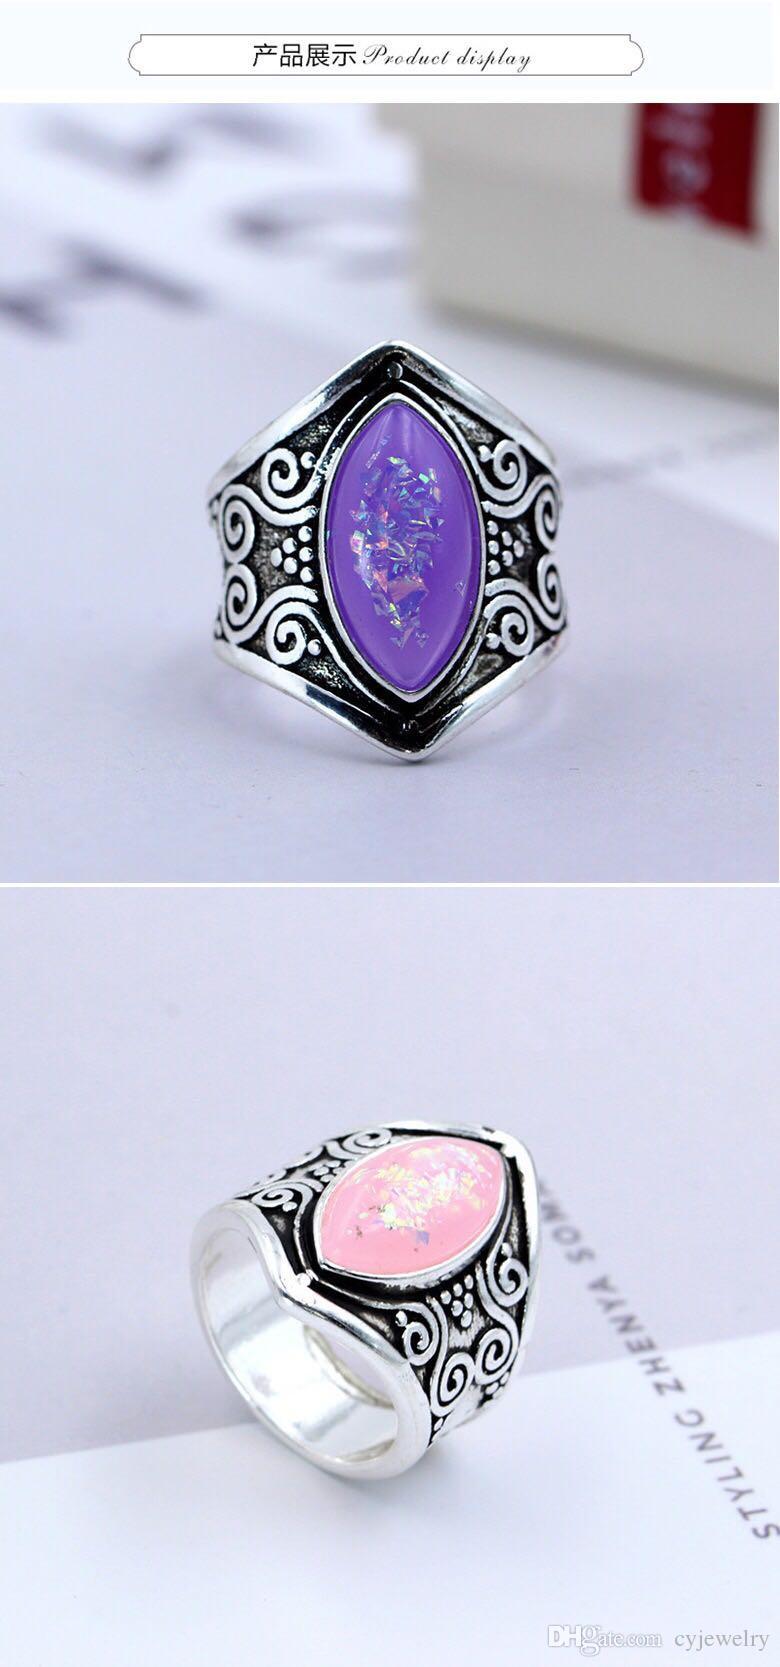 New fashion European reto miinstone silver ring pink/puple opal eye of horse fashion elegant women Jewelry party exaggerated ring size:5-11#